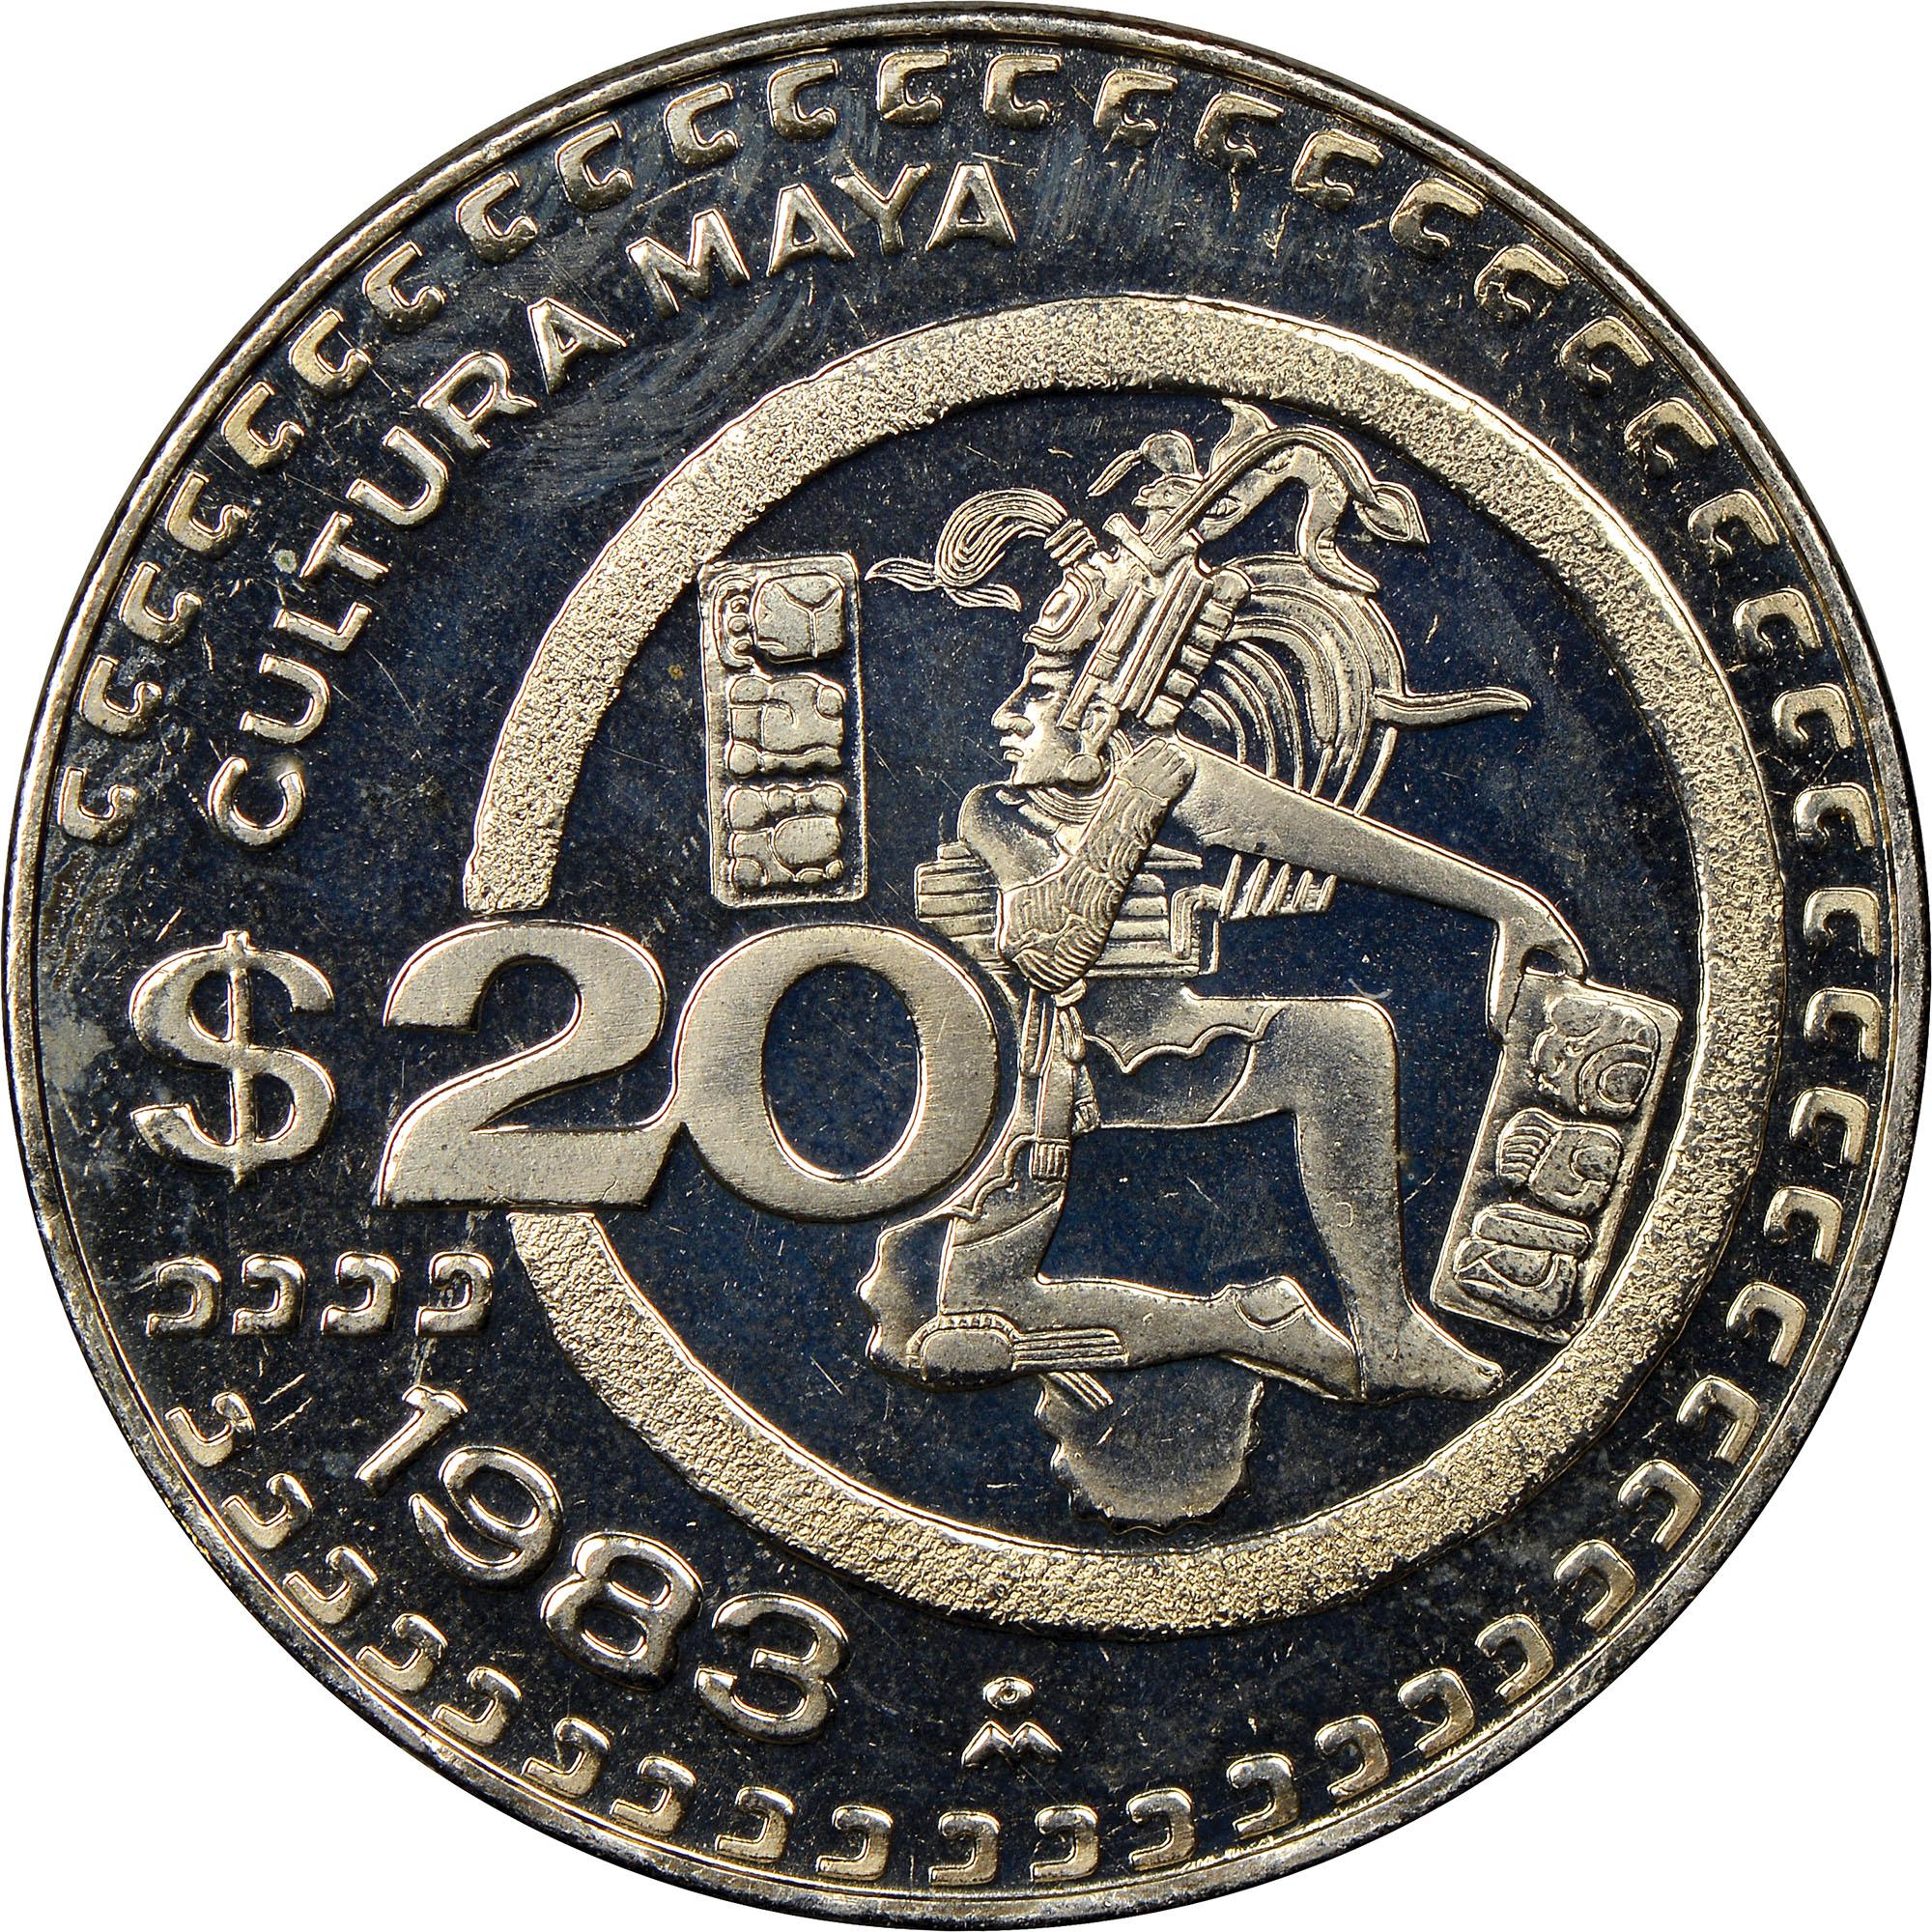 Mexico ESTADOS UNIDOS MEXICANOS 20 Pesos reverse